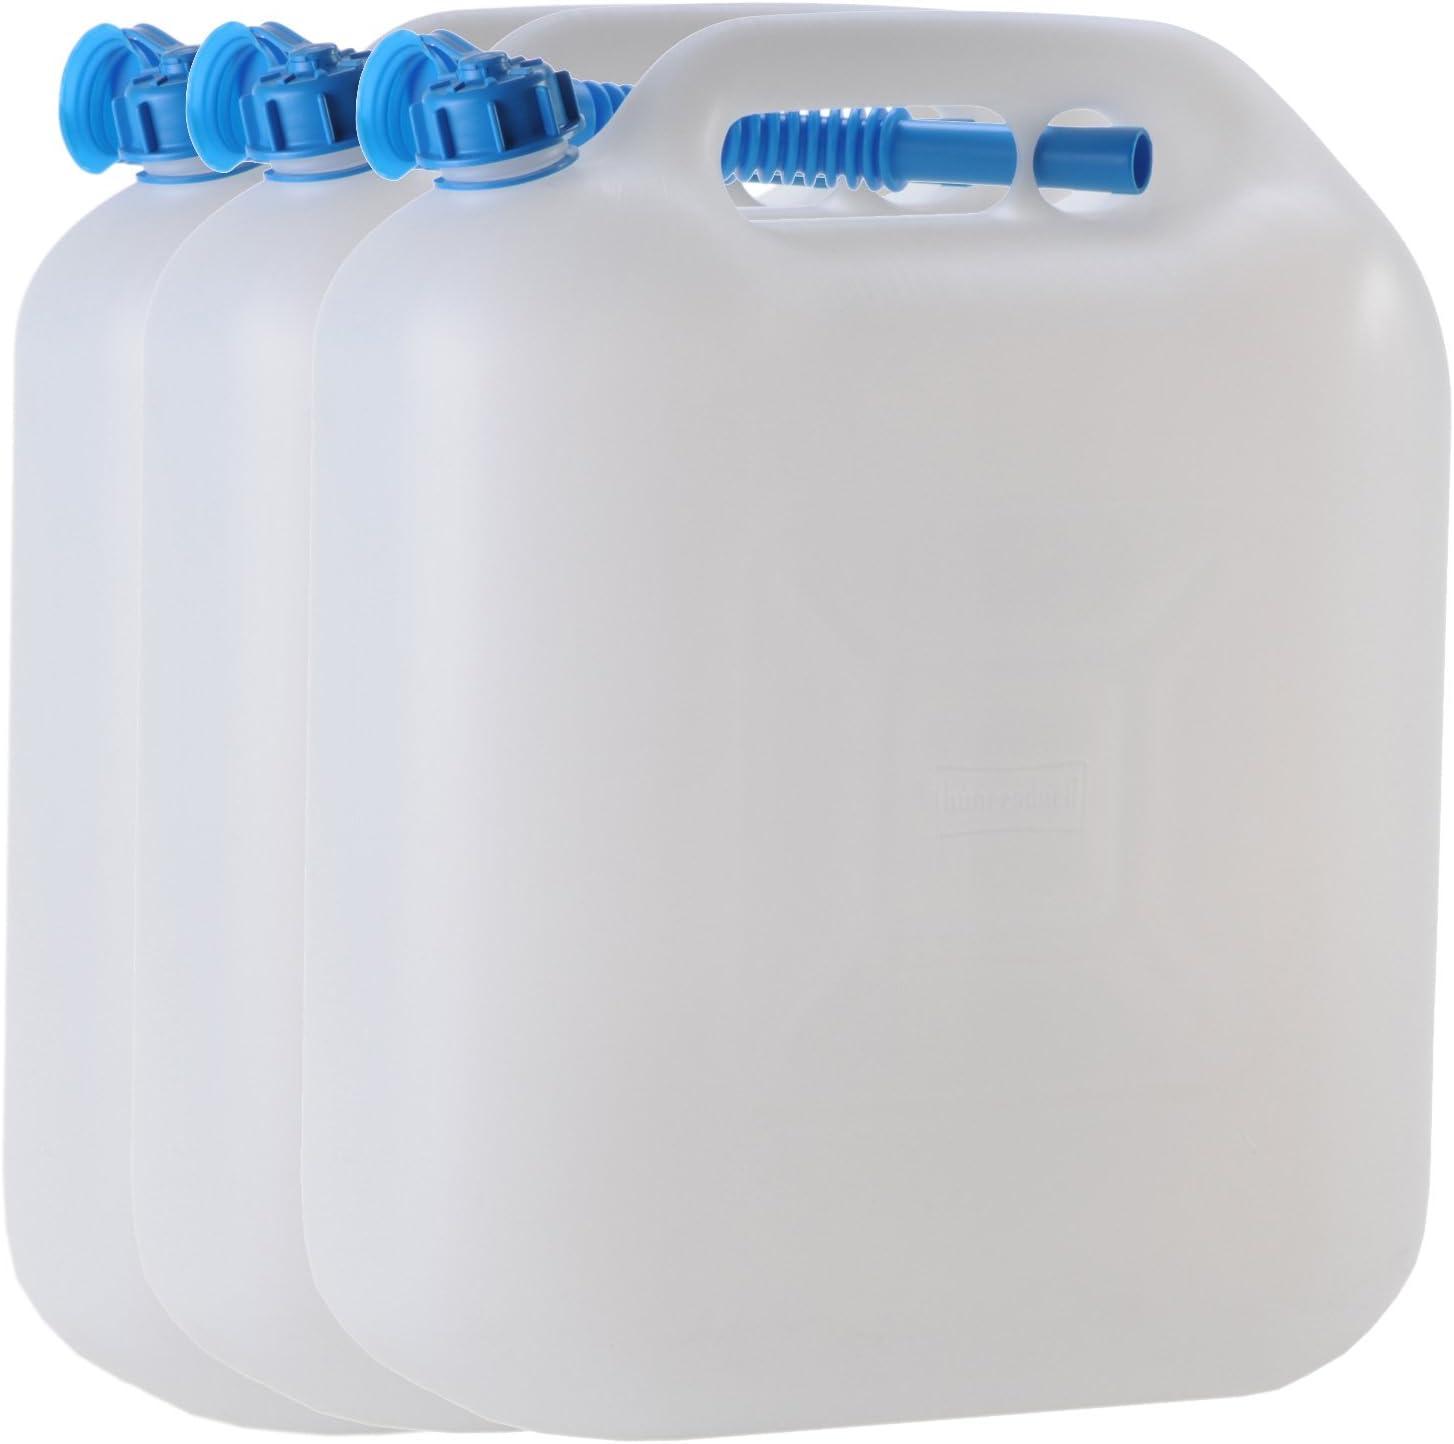 3x Wasserkanister ECO 10 Liter mit Rohr NEU 3er Set Camping-Kanister Wassertank